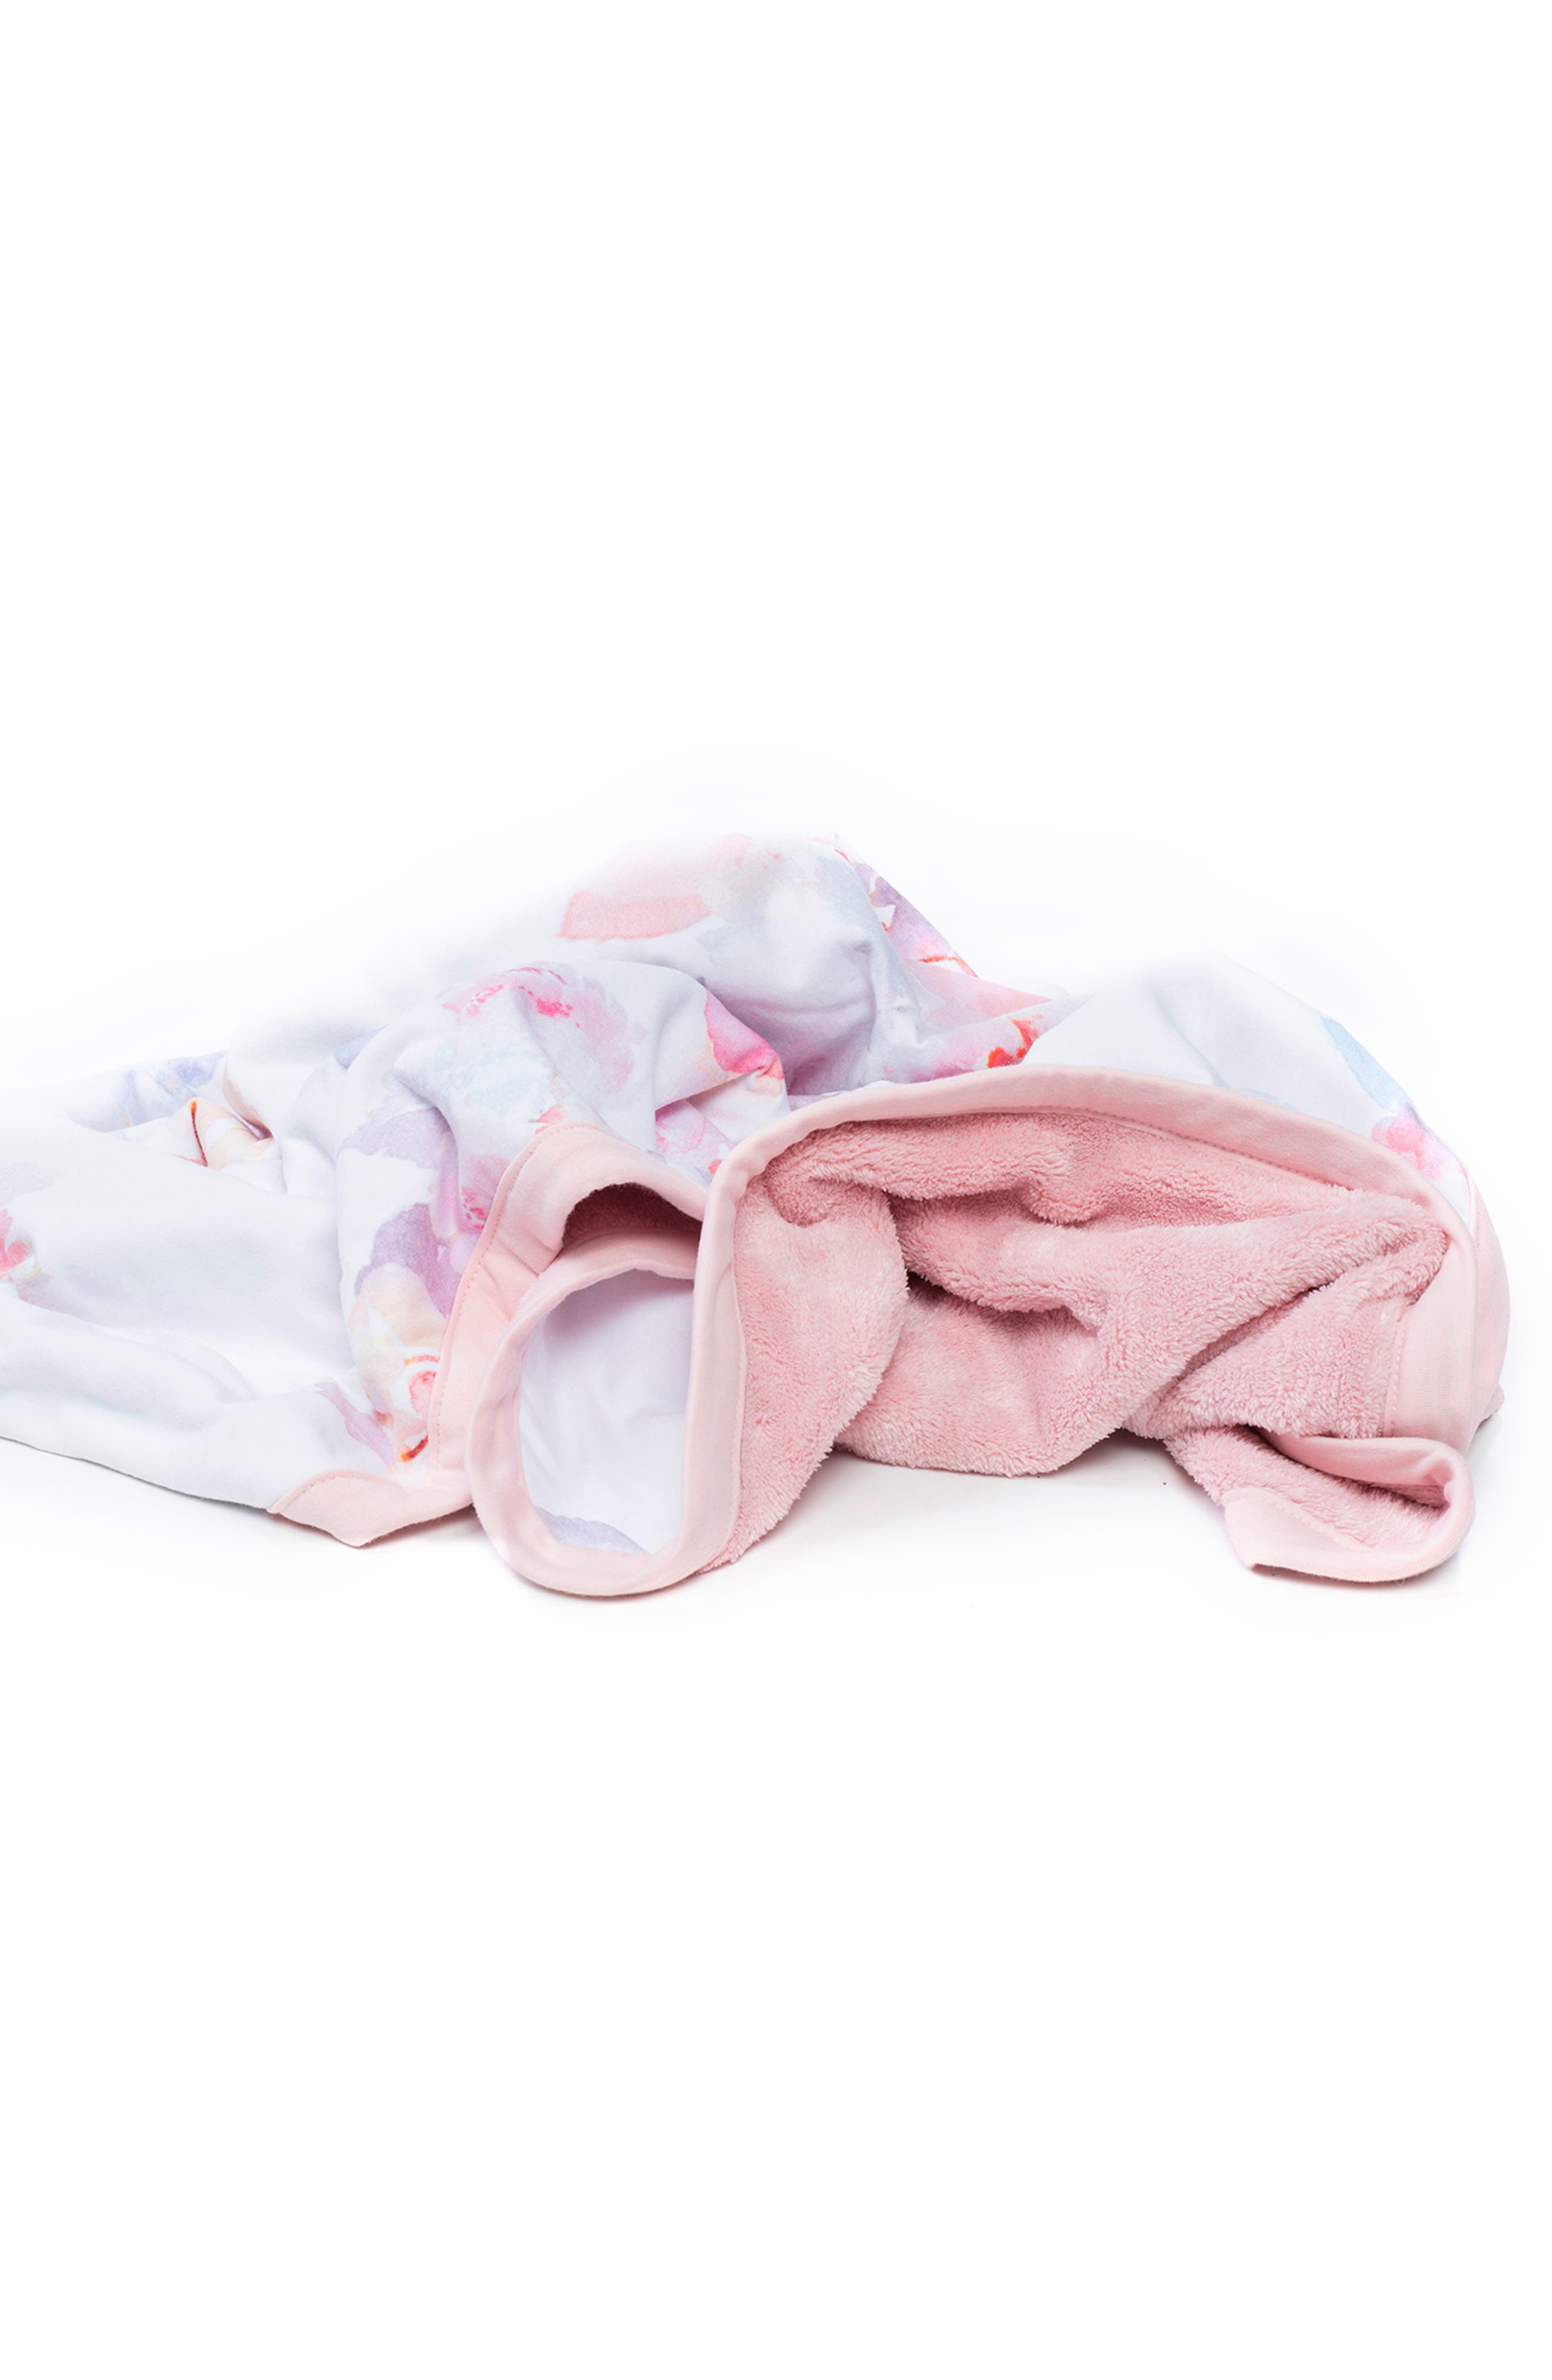 Prim Cuddle Blanket,                             Alternate thumbnail 2, color,                             PRIM